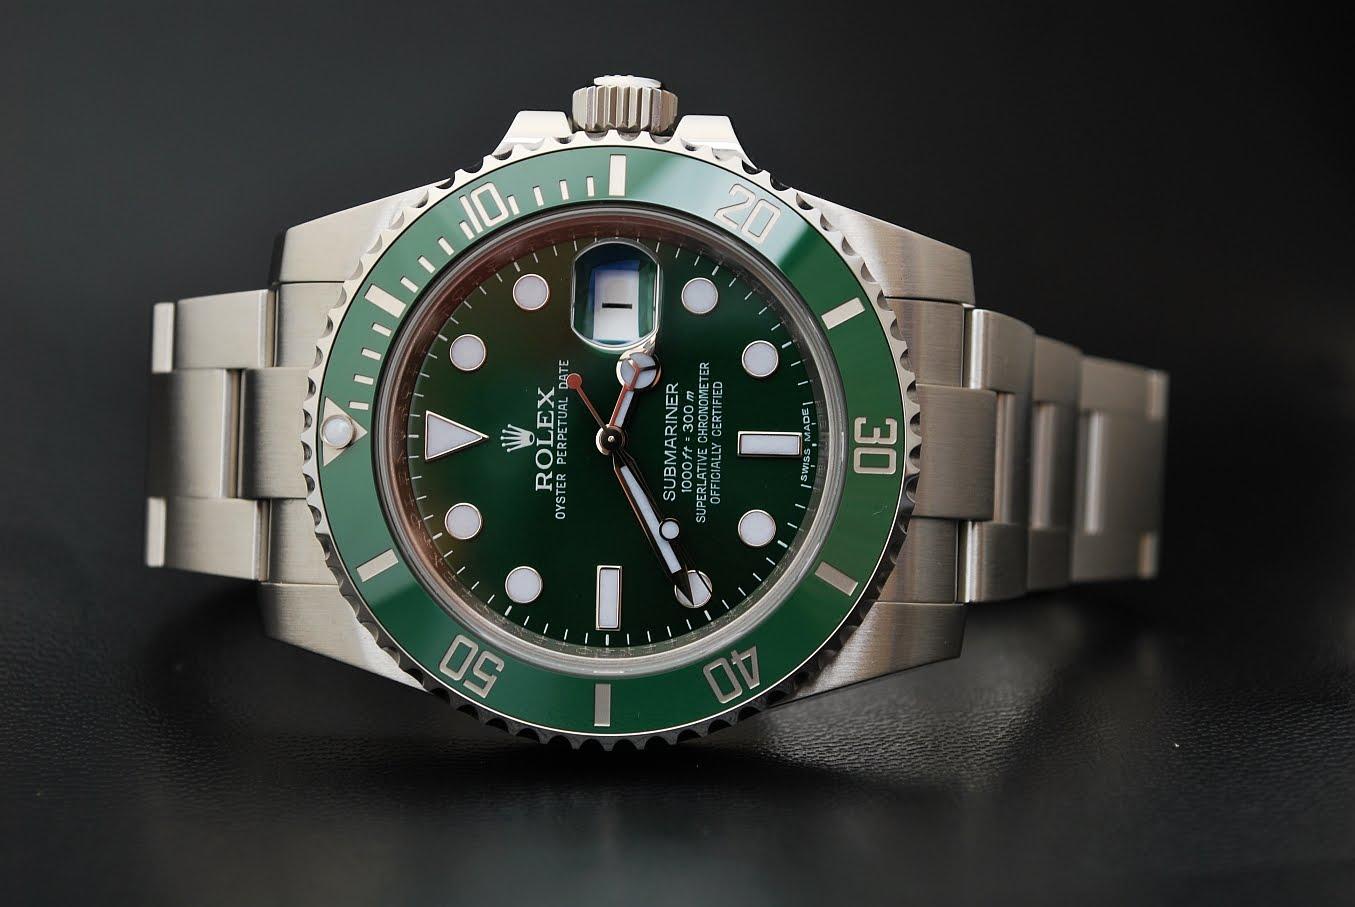 Naziv: Rolex 116610 LV b.jpg, pregleda: 2669, veličina: 108,4 KB